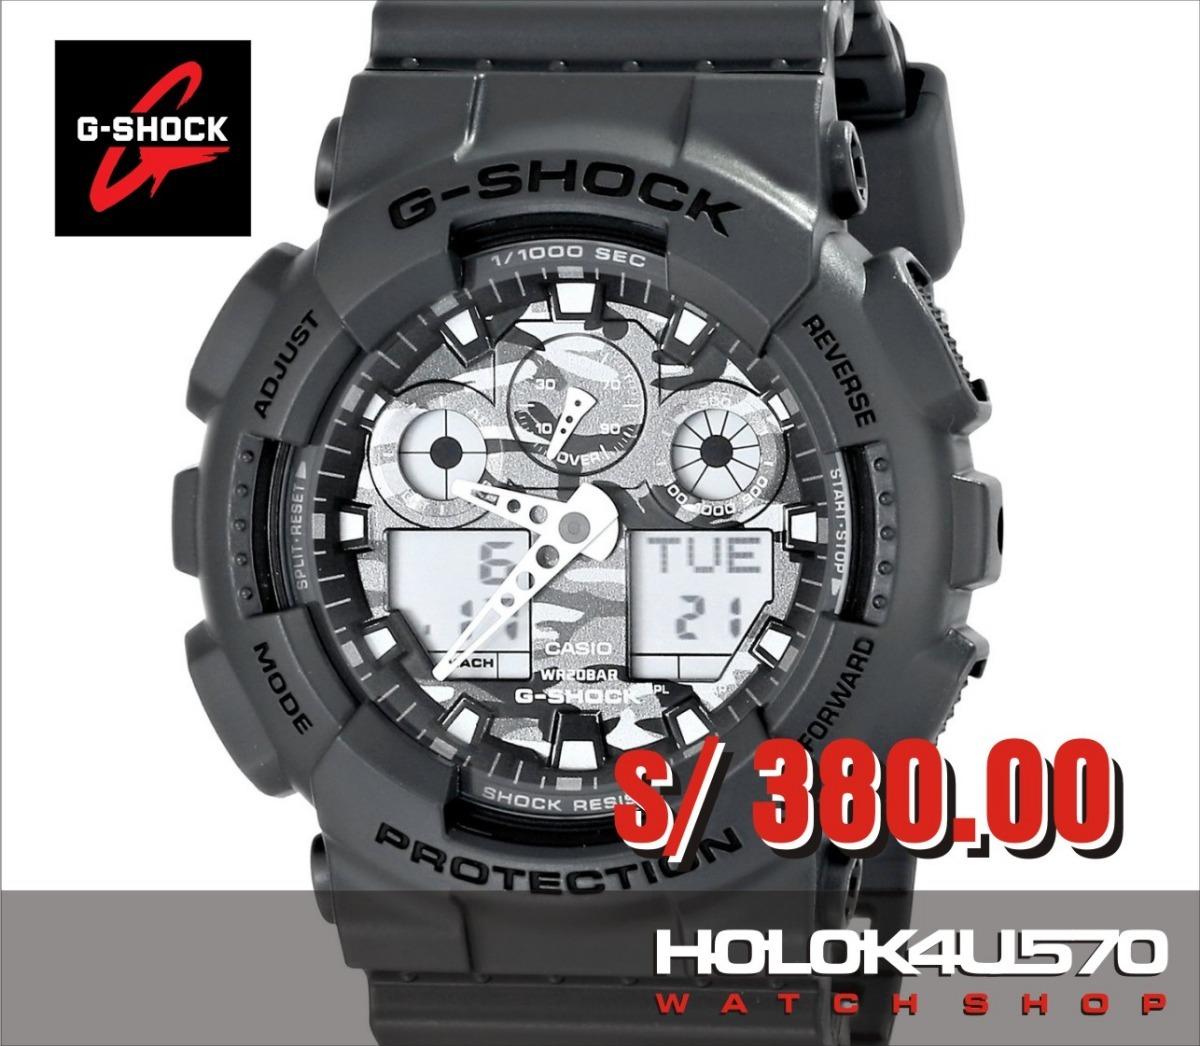 0148aca36b64 Reloj Casio G-shock Ga-110gb-1a - 100% Nuevo Y Original - S  350